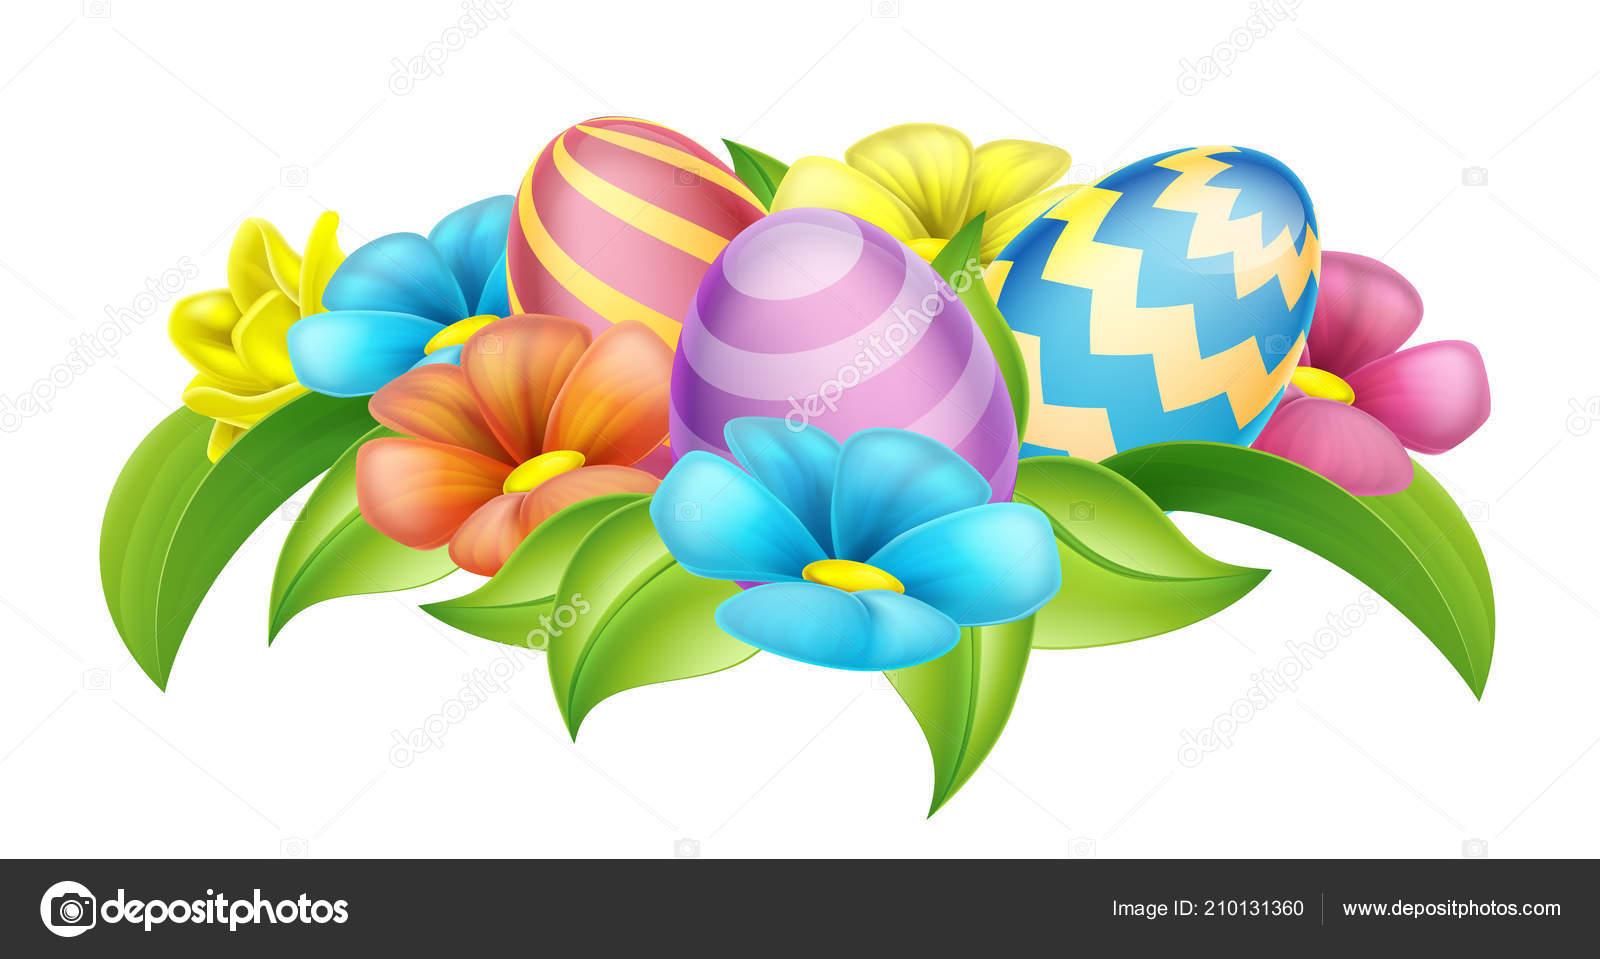 Easter eggs spring flowers cartoon design element stock vector easter eggs spring flowers cartoon design element stock vector mightylinksfo